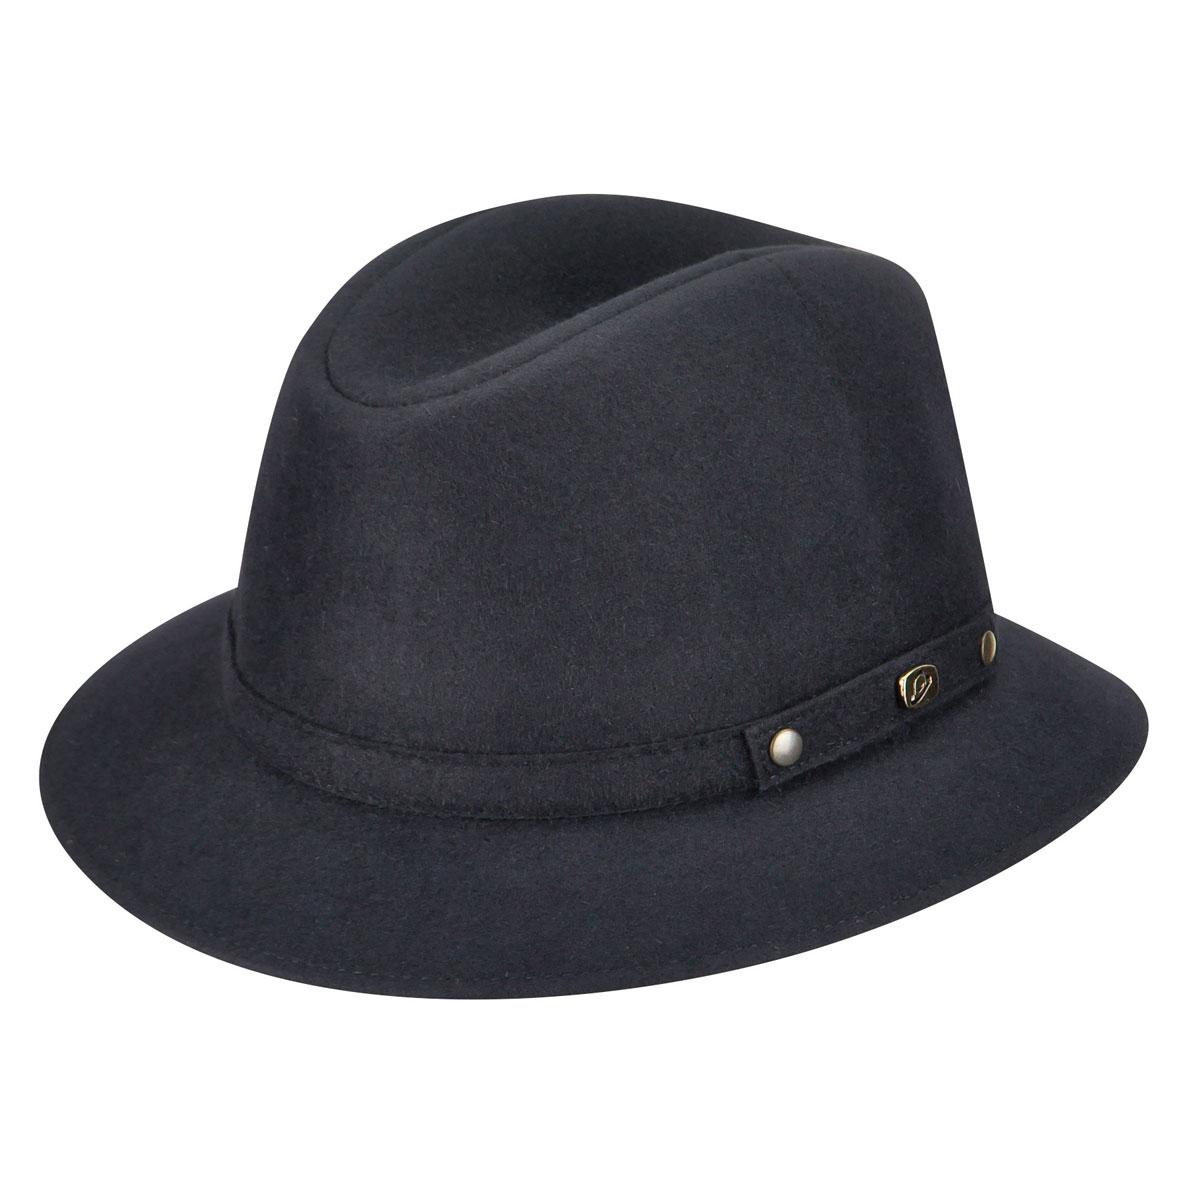 a5e9763ec02d5 Borsalino Male 390083 Alessandria Fur Felt Fedora 7 7 8 Blue